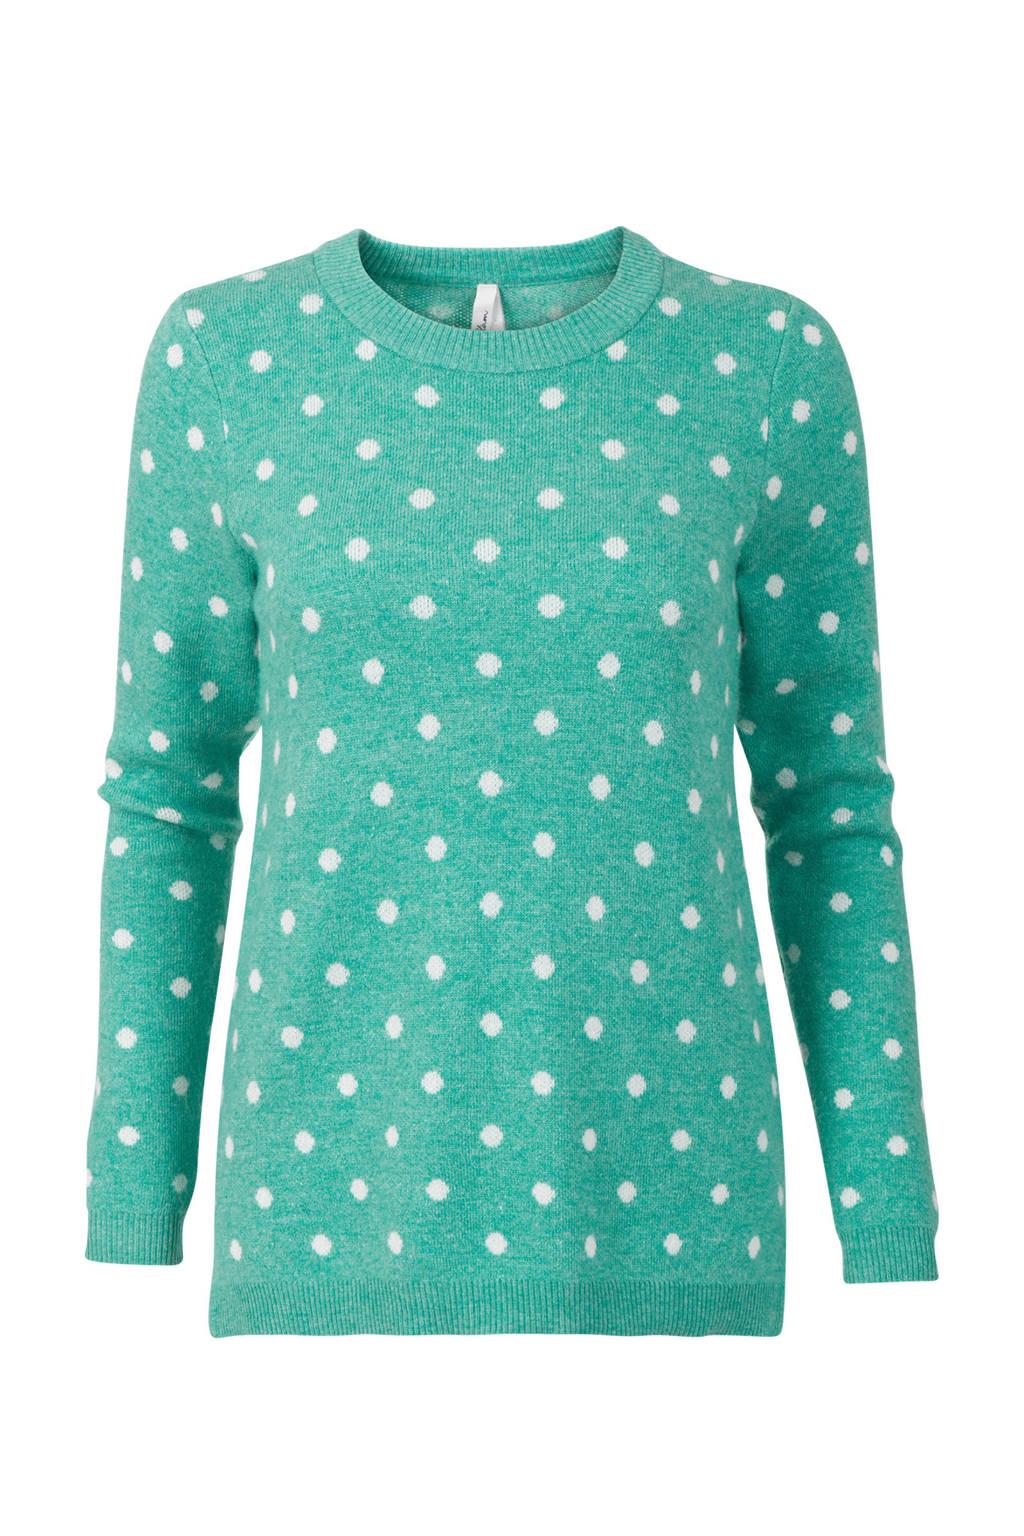 Miss Etam Regulier trui met stippen groen, Groen